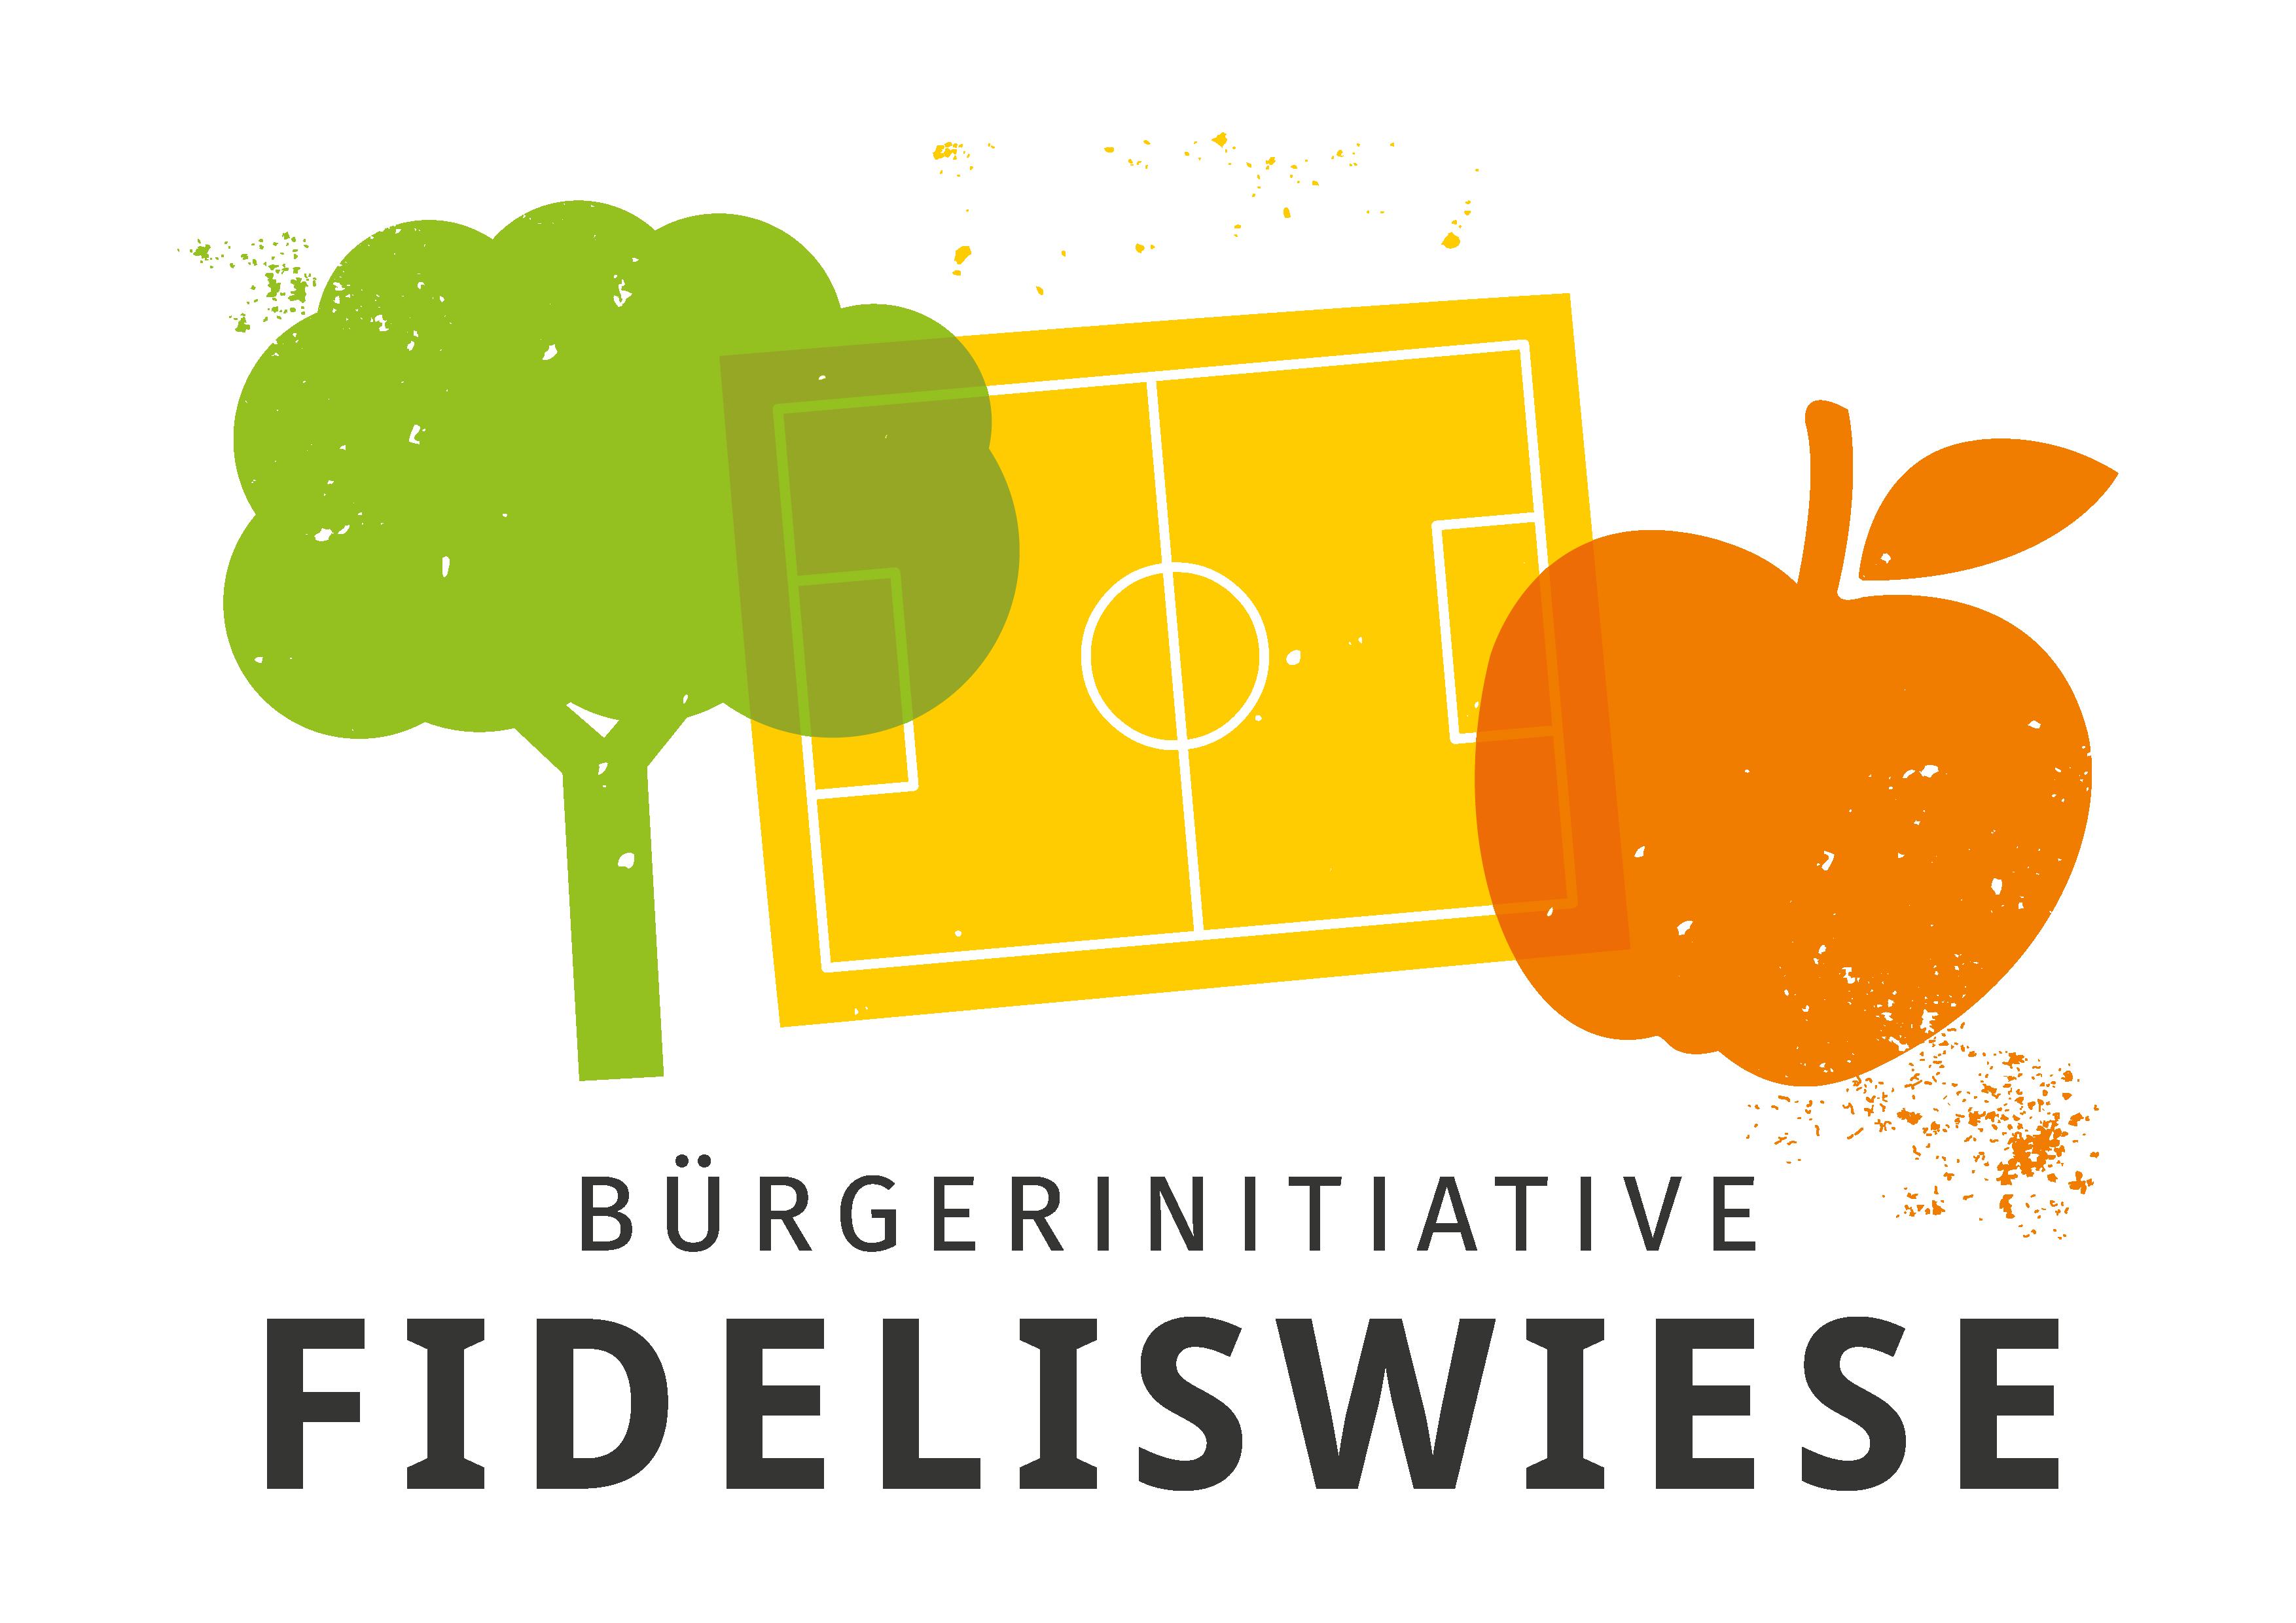 Bürgerinitiative Fideliswiese